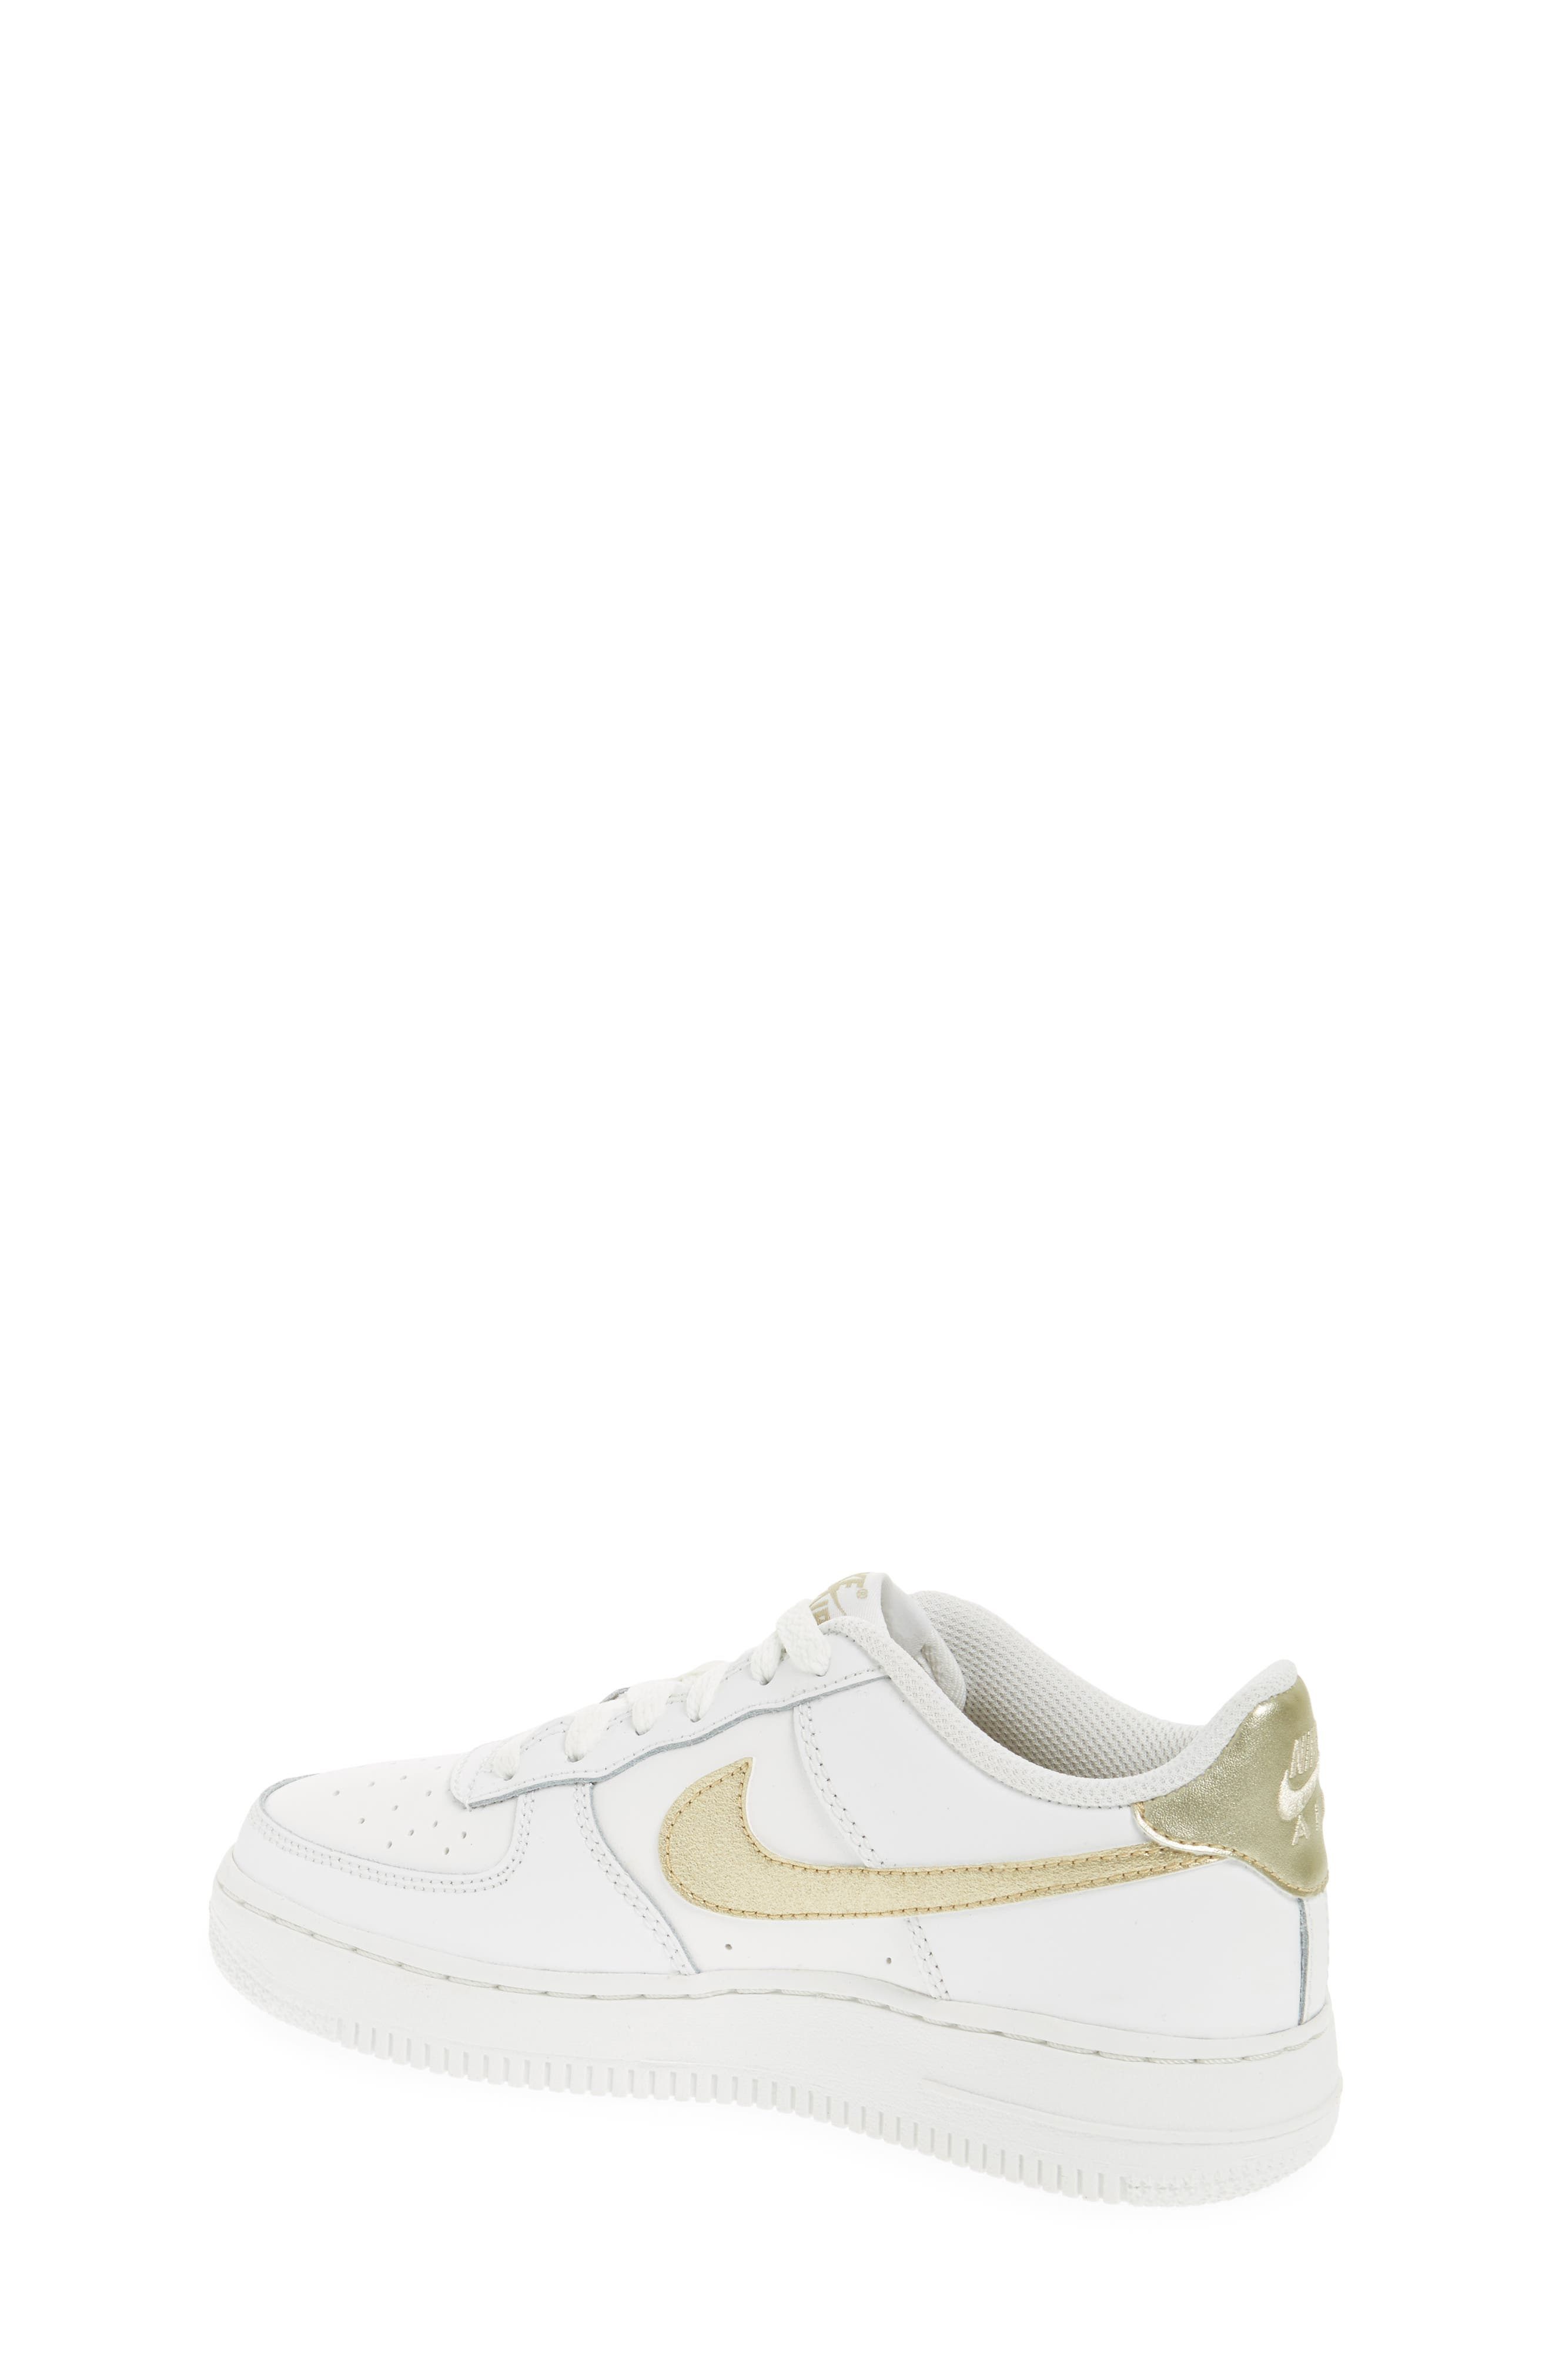 Air Force 1 '06 Sneaker,                             Alternate thumbnail 4, color,